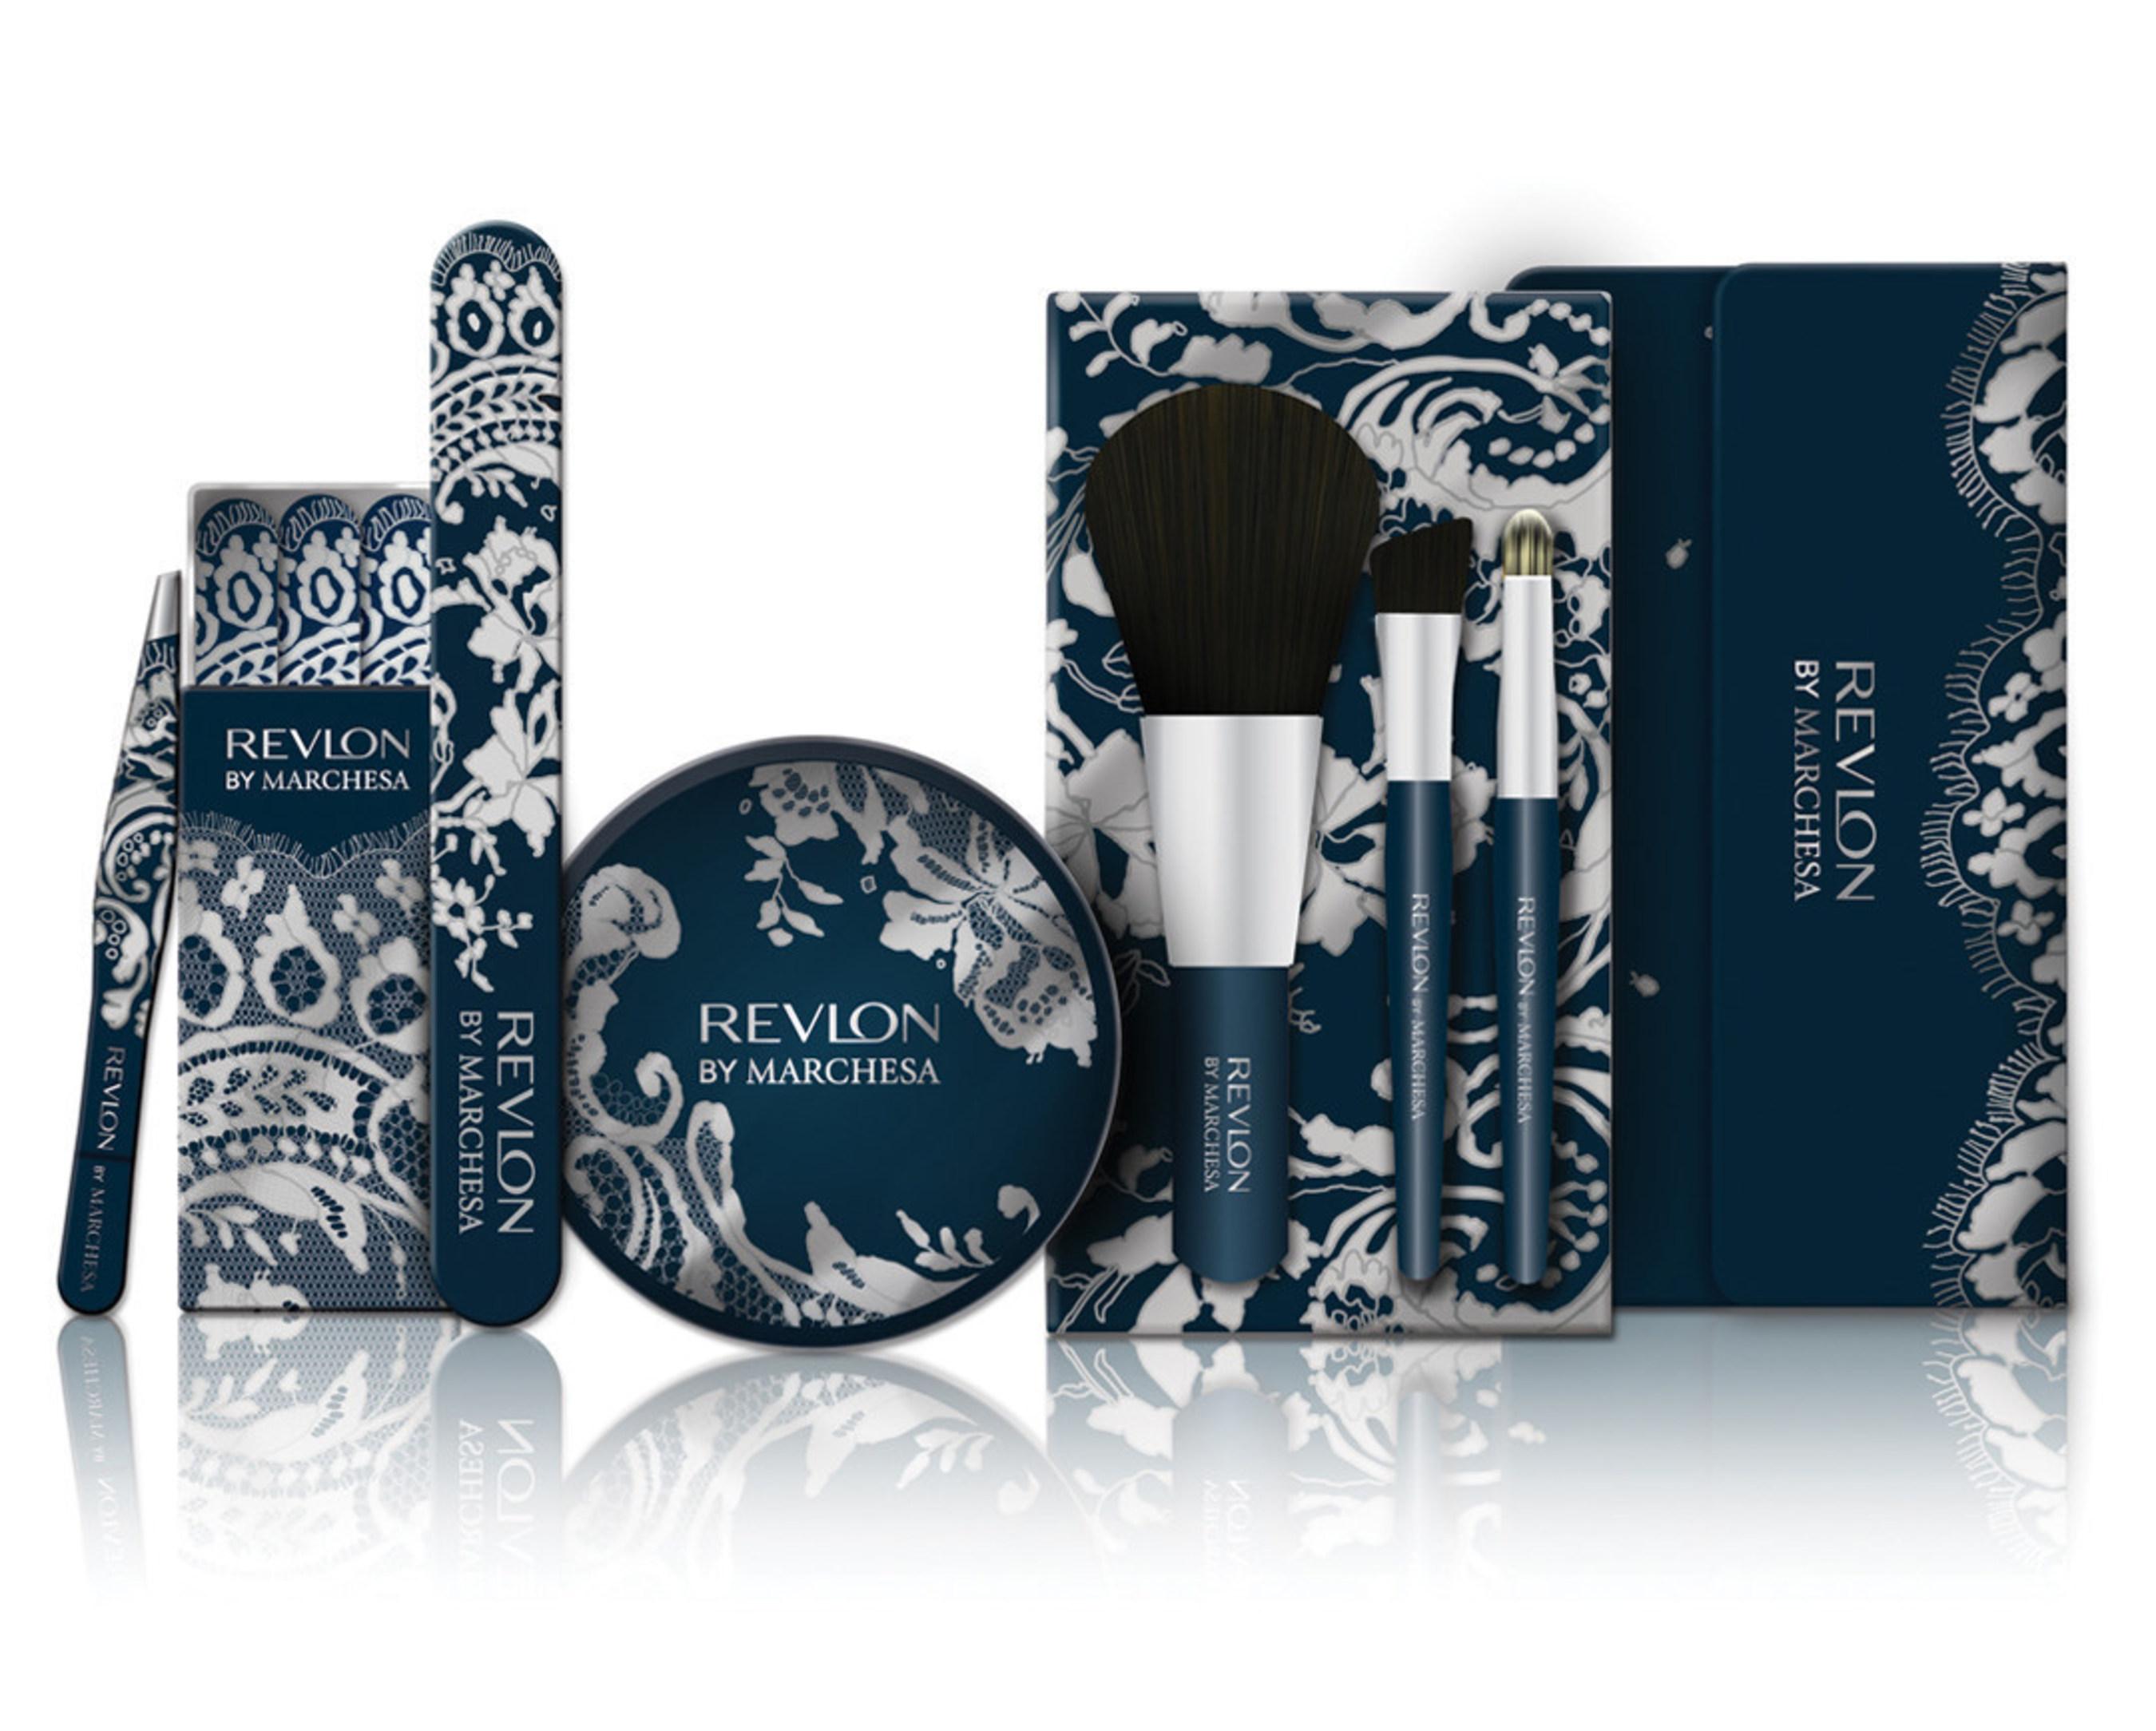 Revlon Beauty Tools - Marchesa Collection, Design: Anthem (New York)